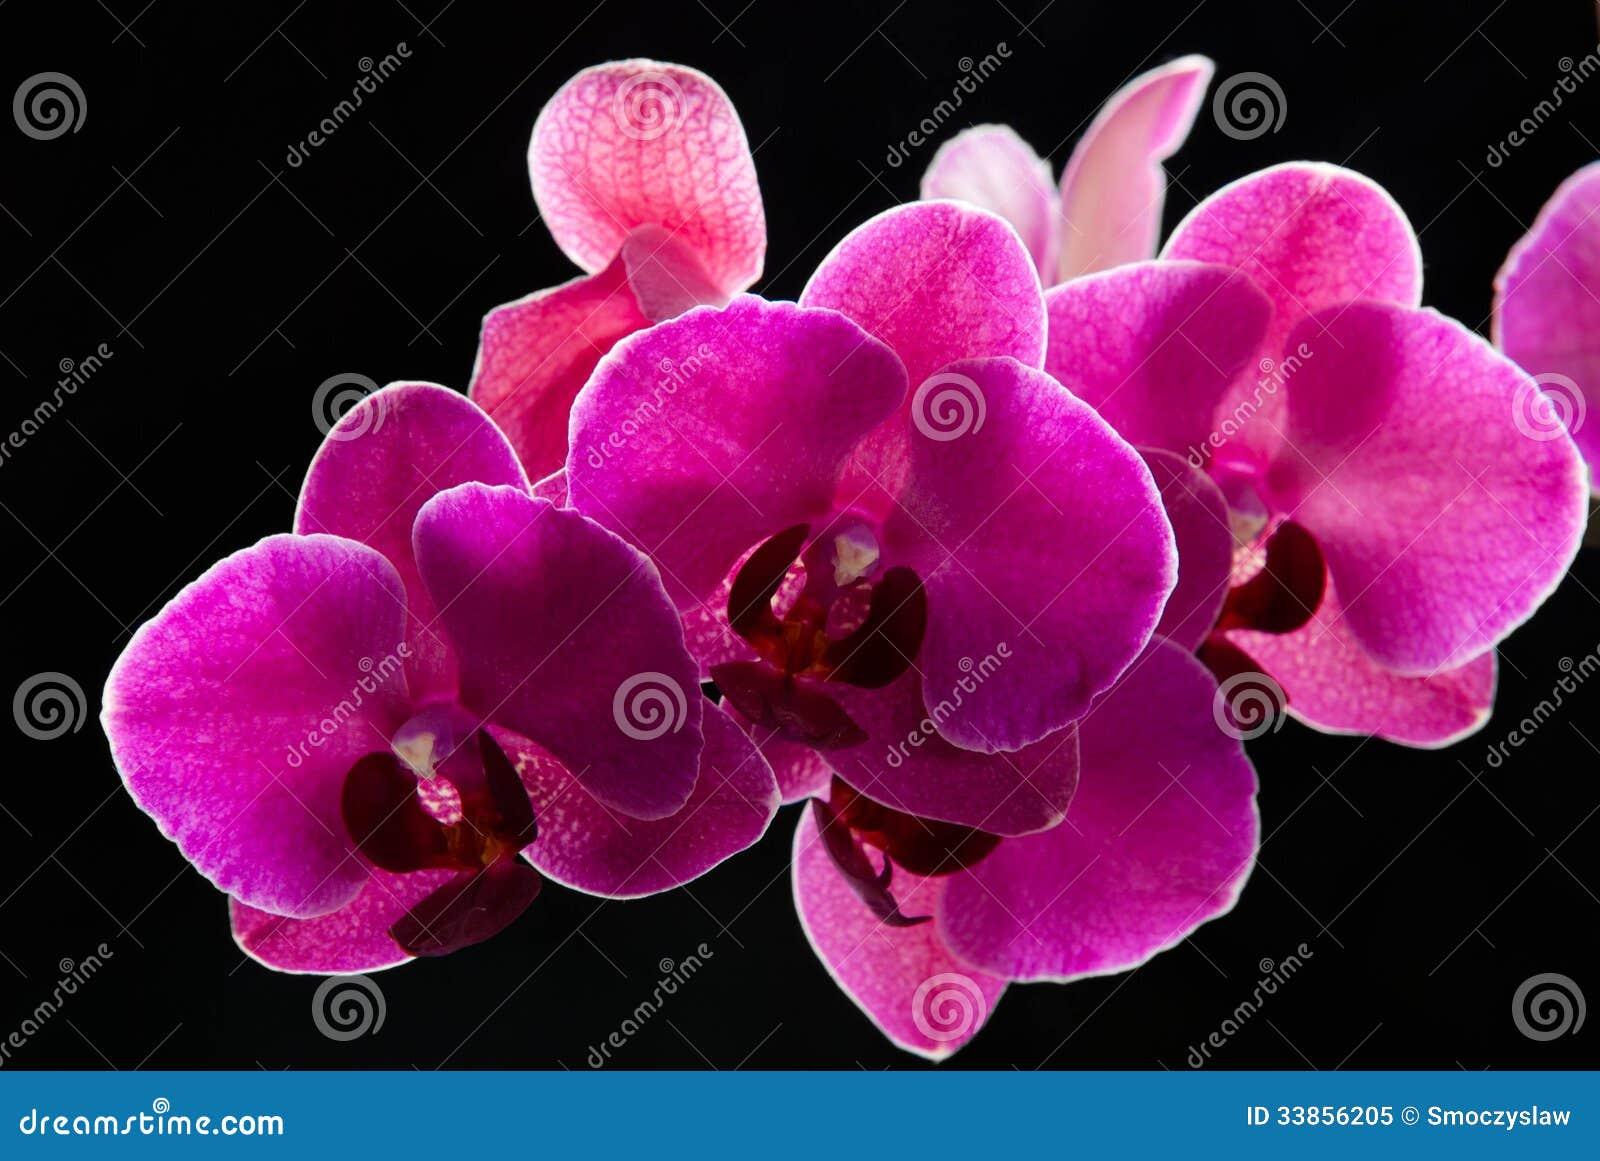 Orchideenblumen